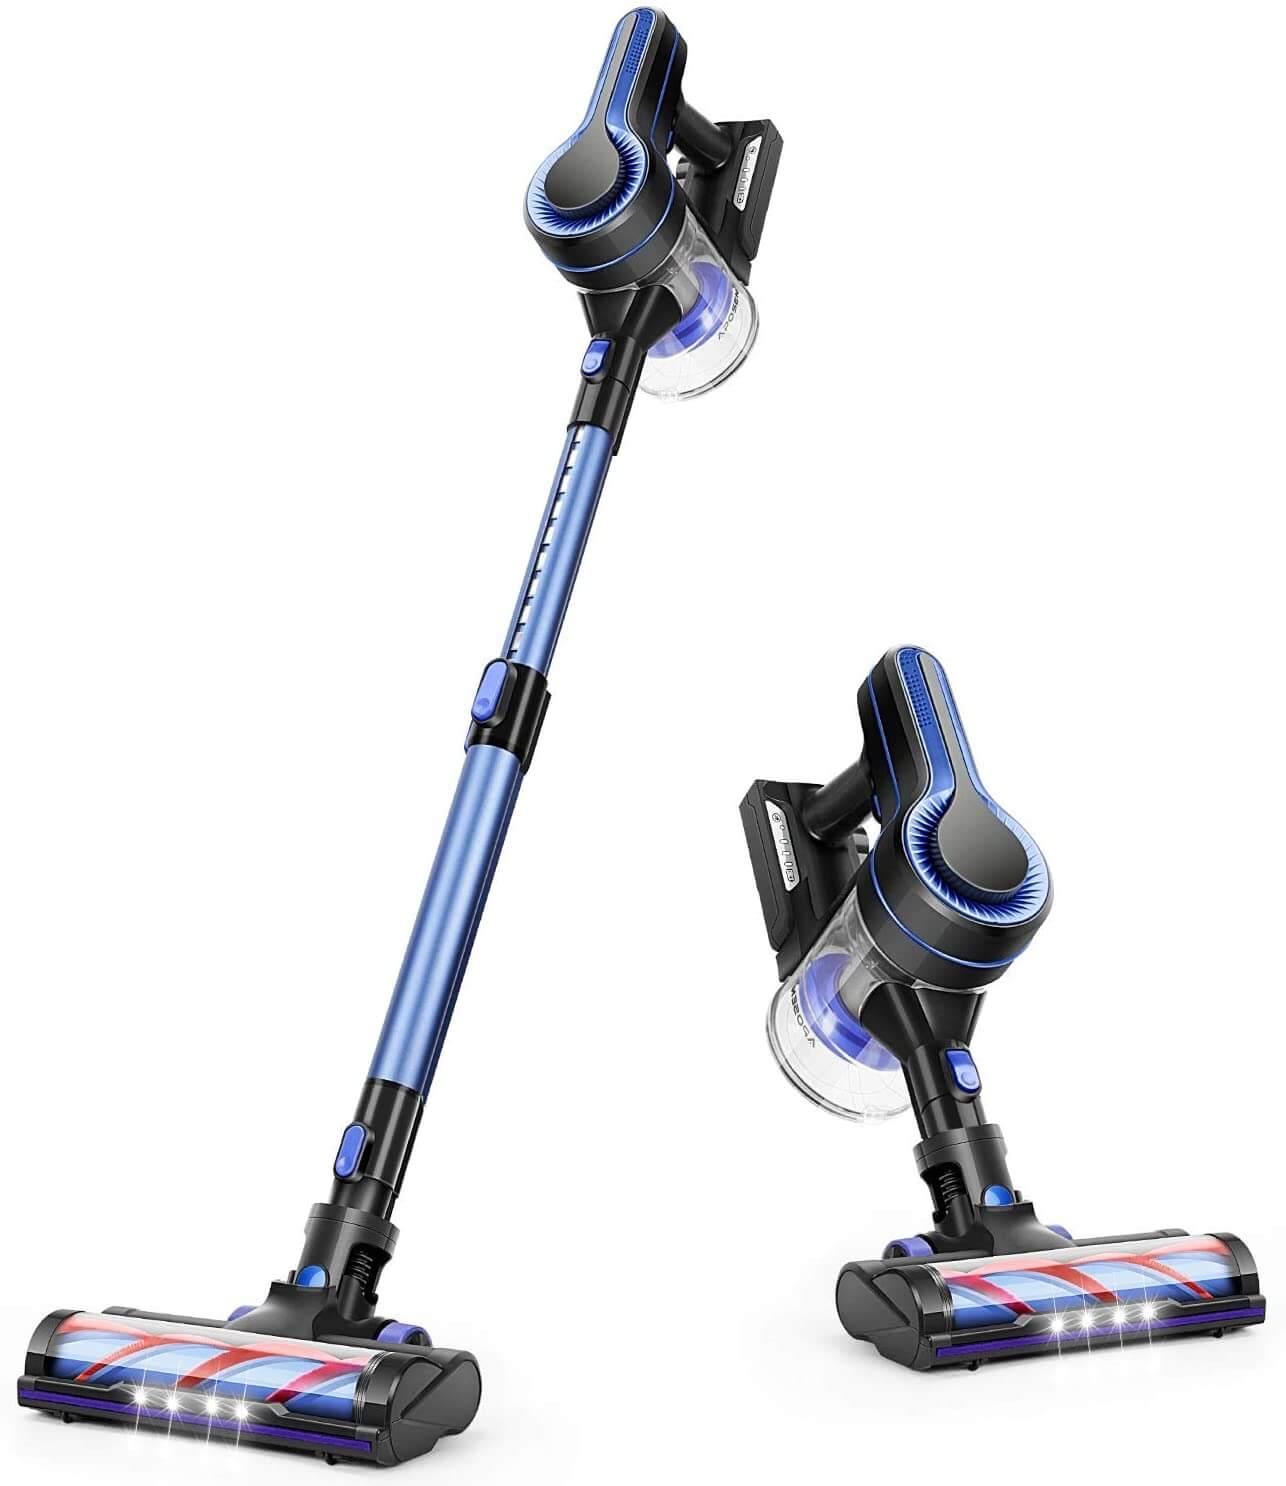 Vacuum Cleaner for Home Hard Floor ST600 14